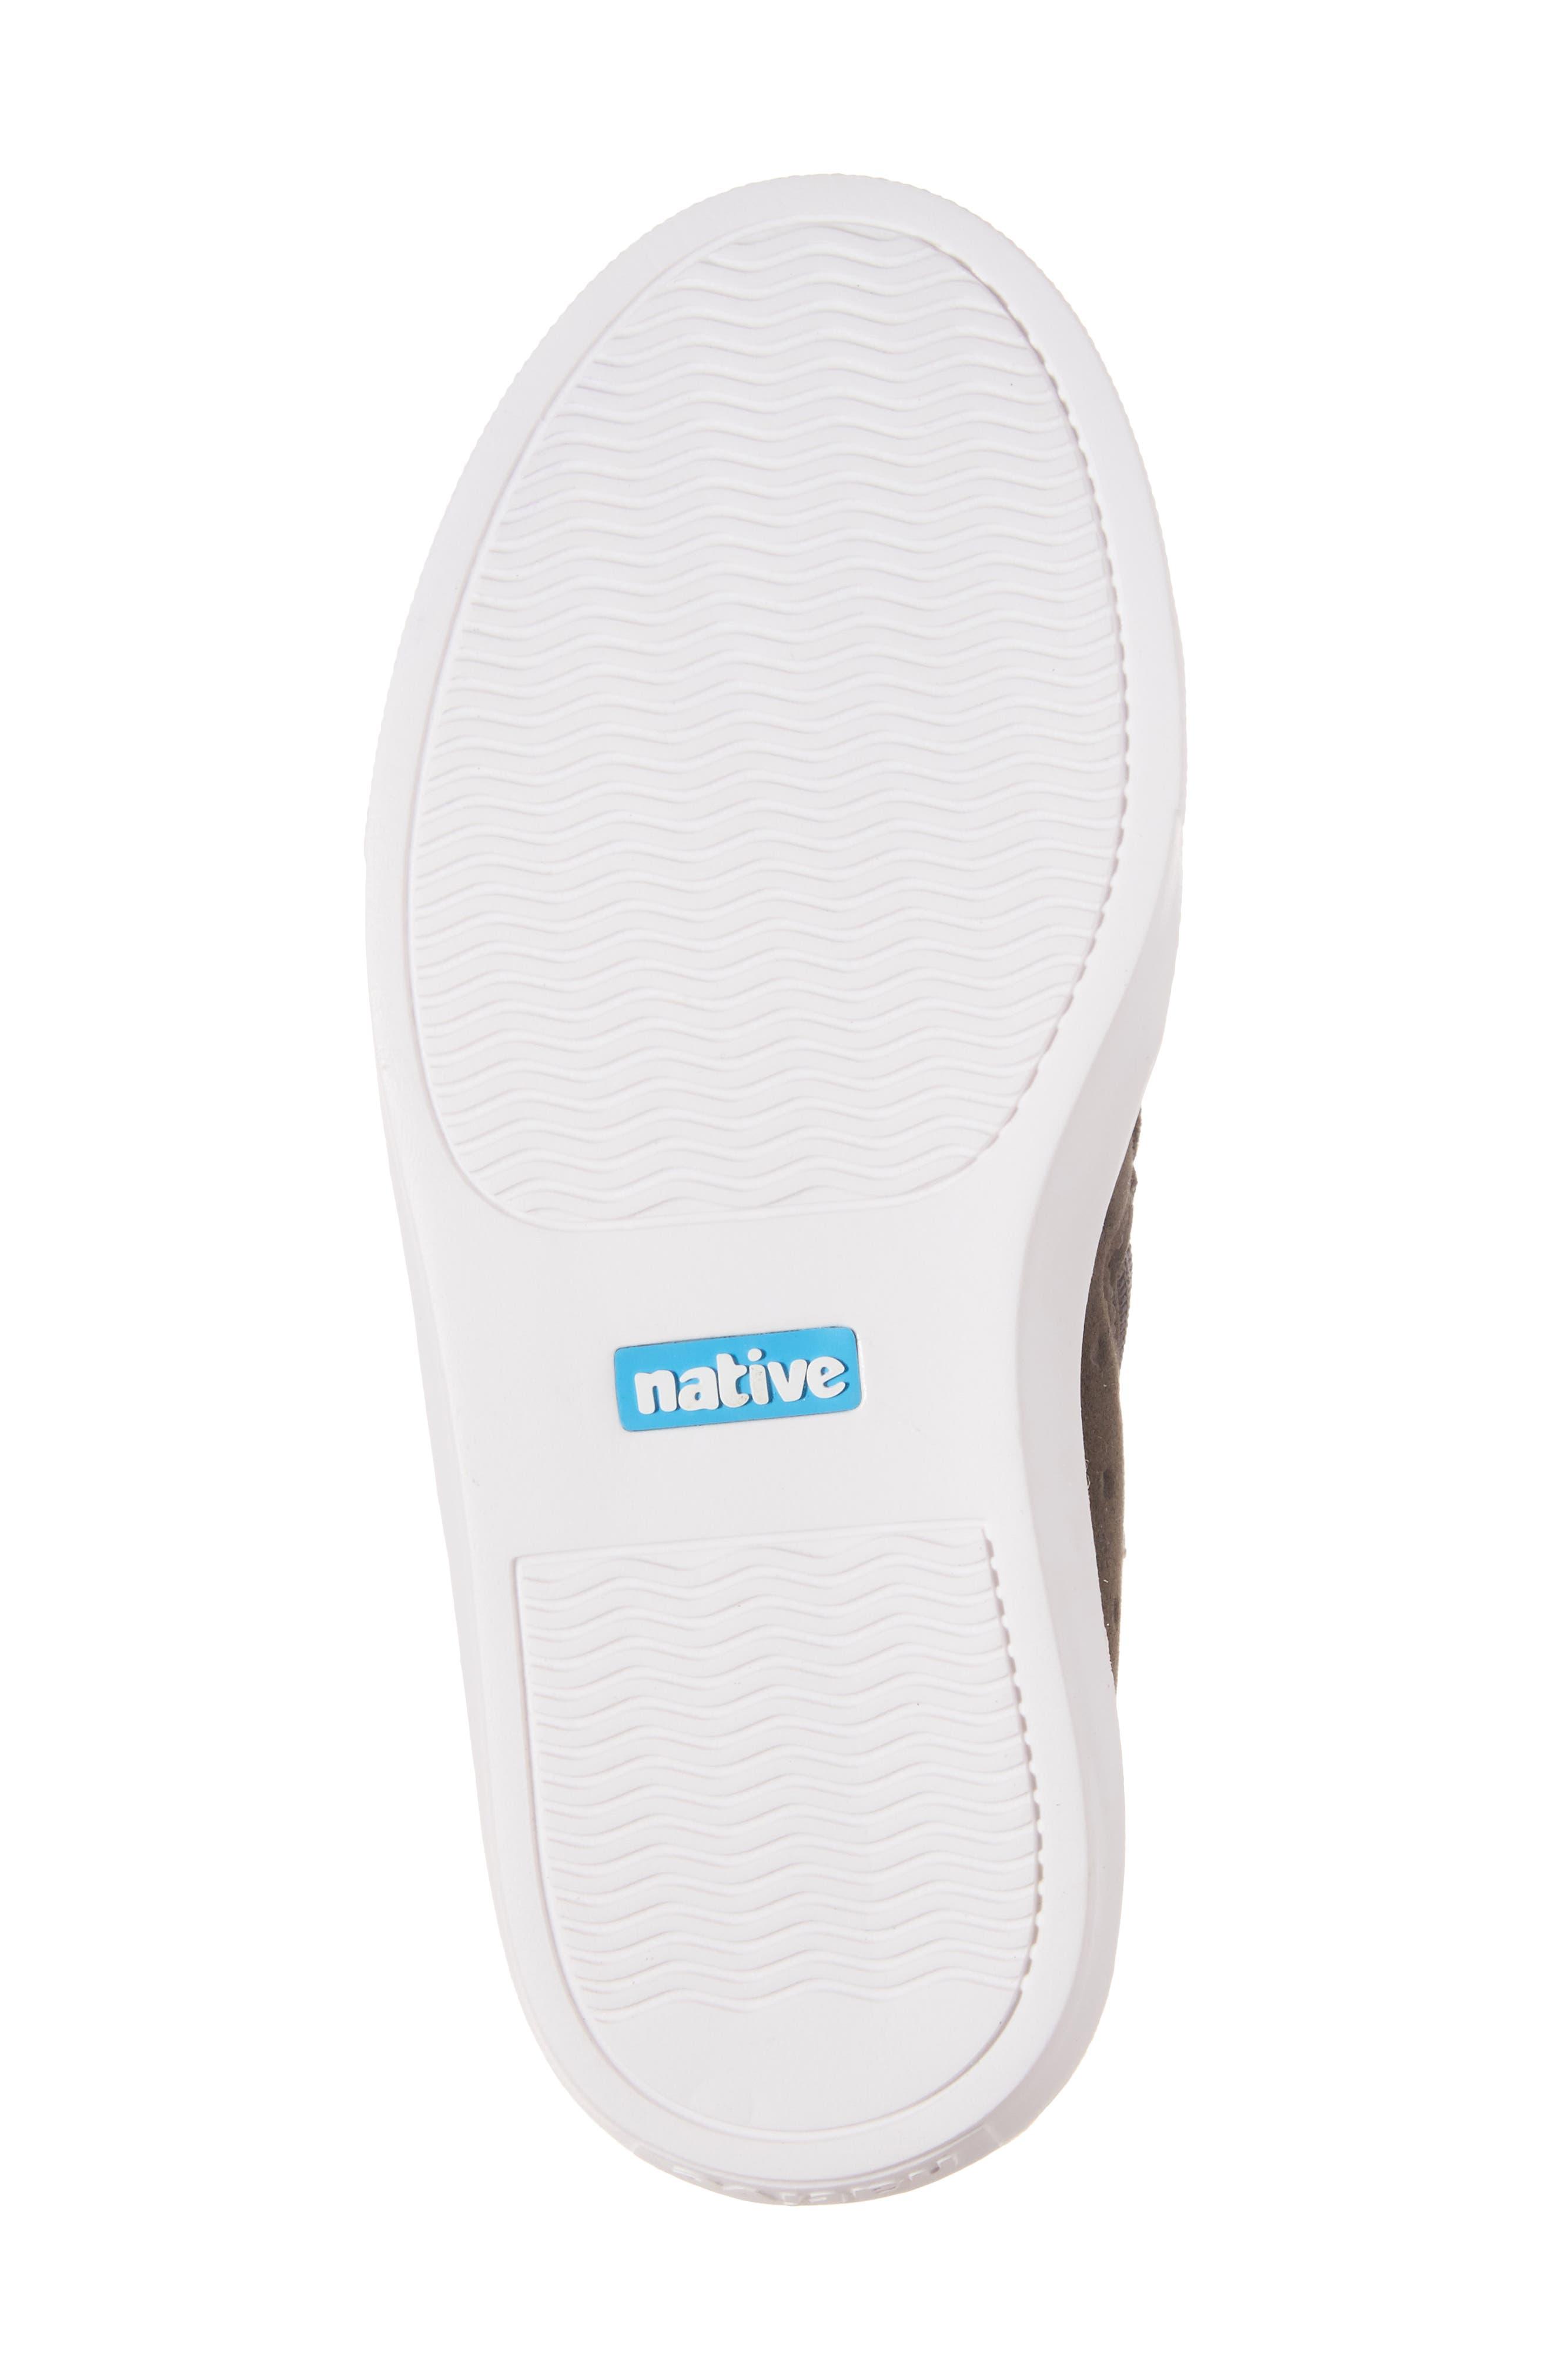 Native Monaco Sneaker,                             Alternate thumbnail 6, color,                             024